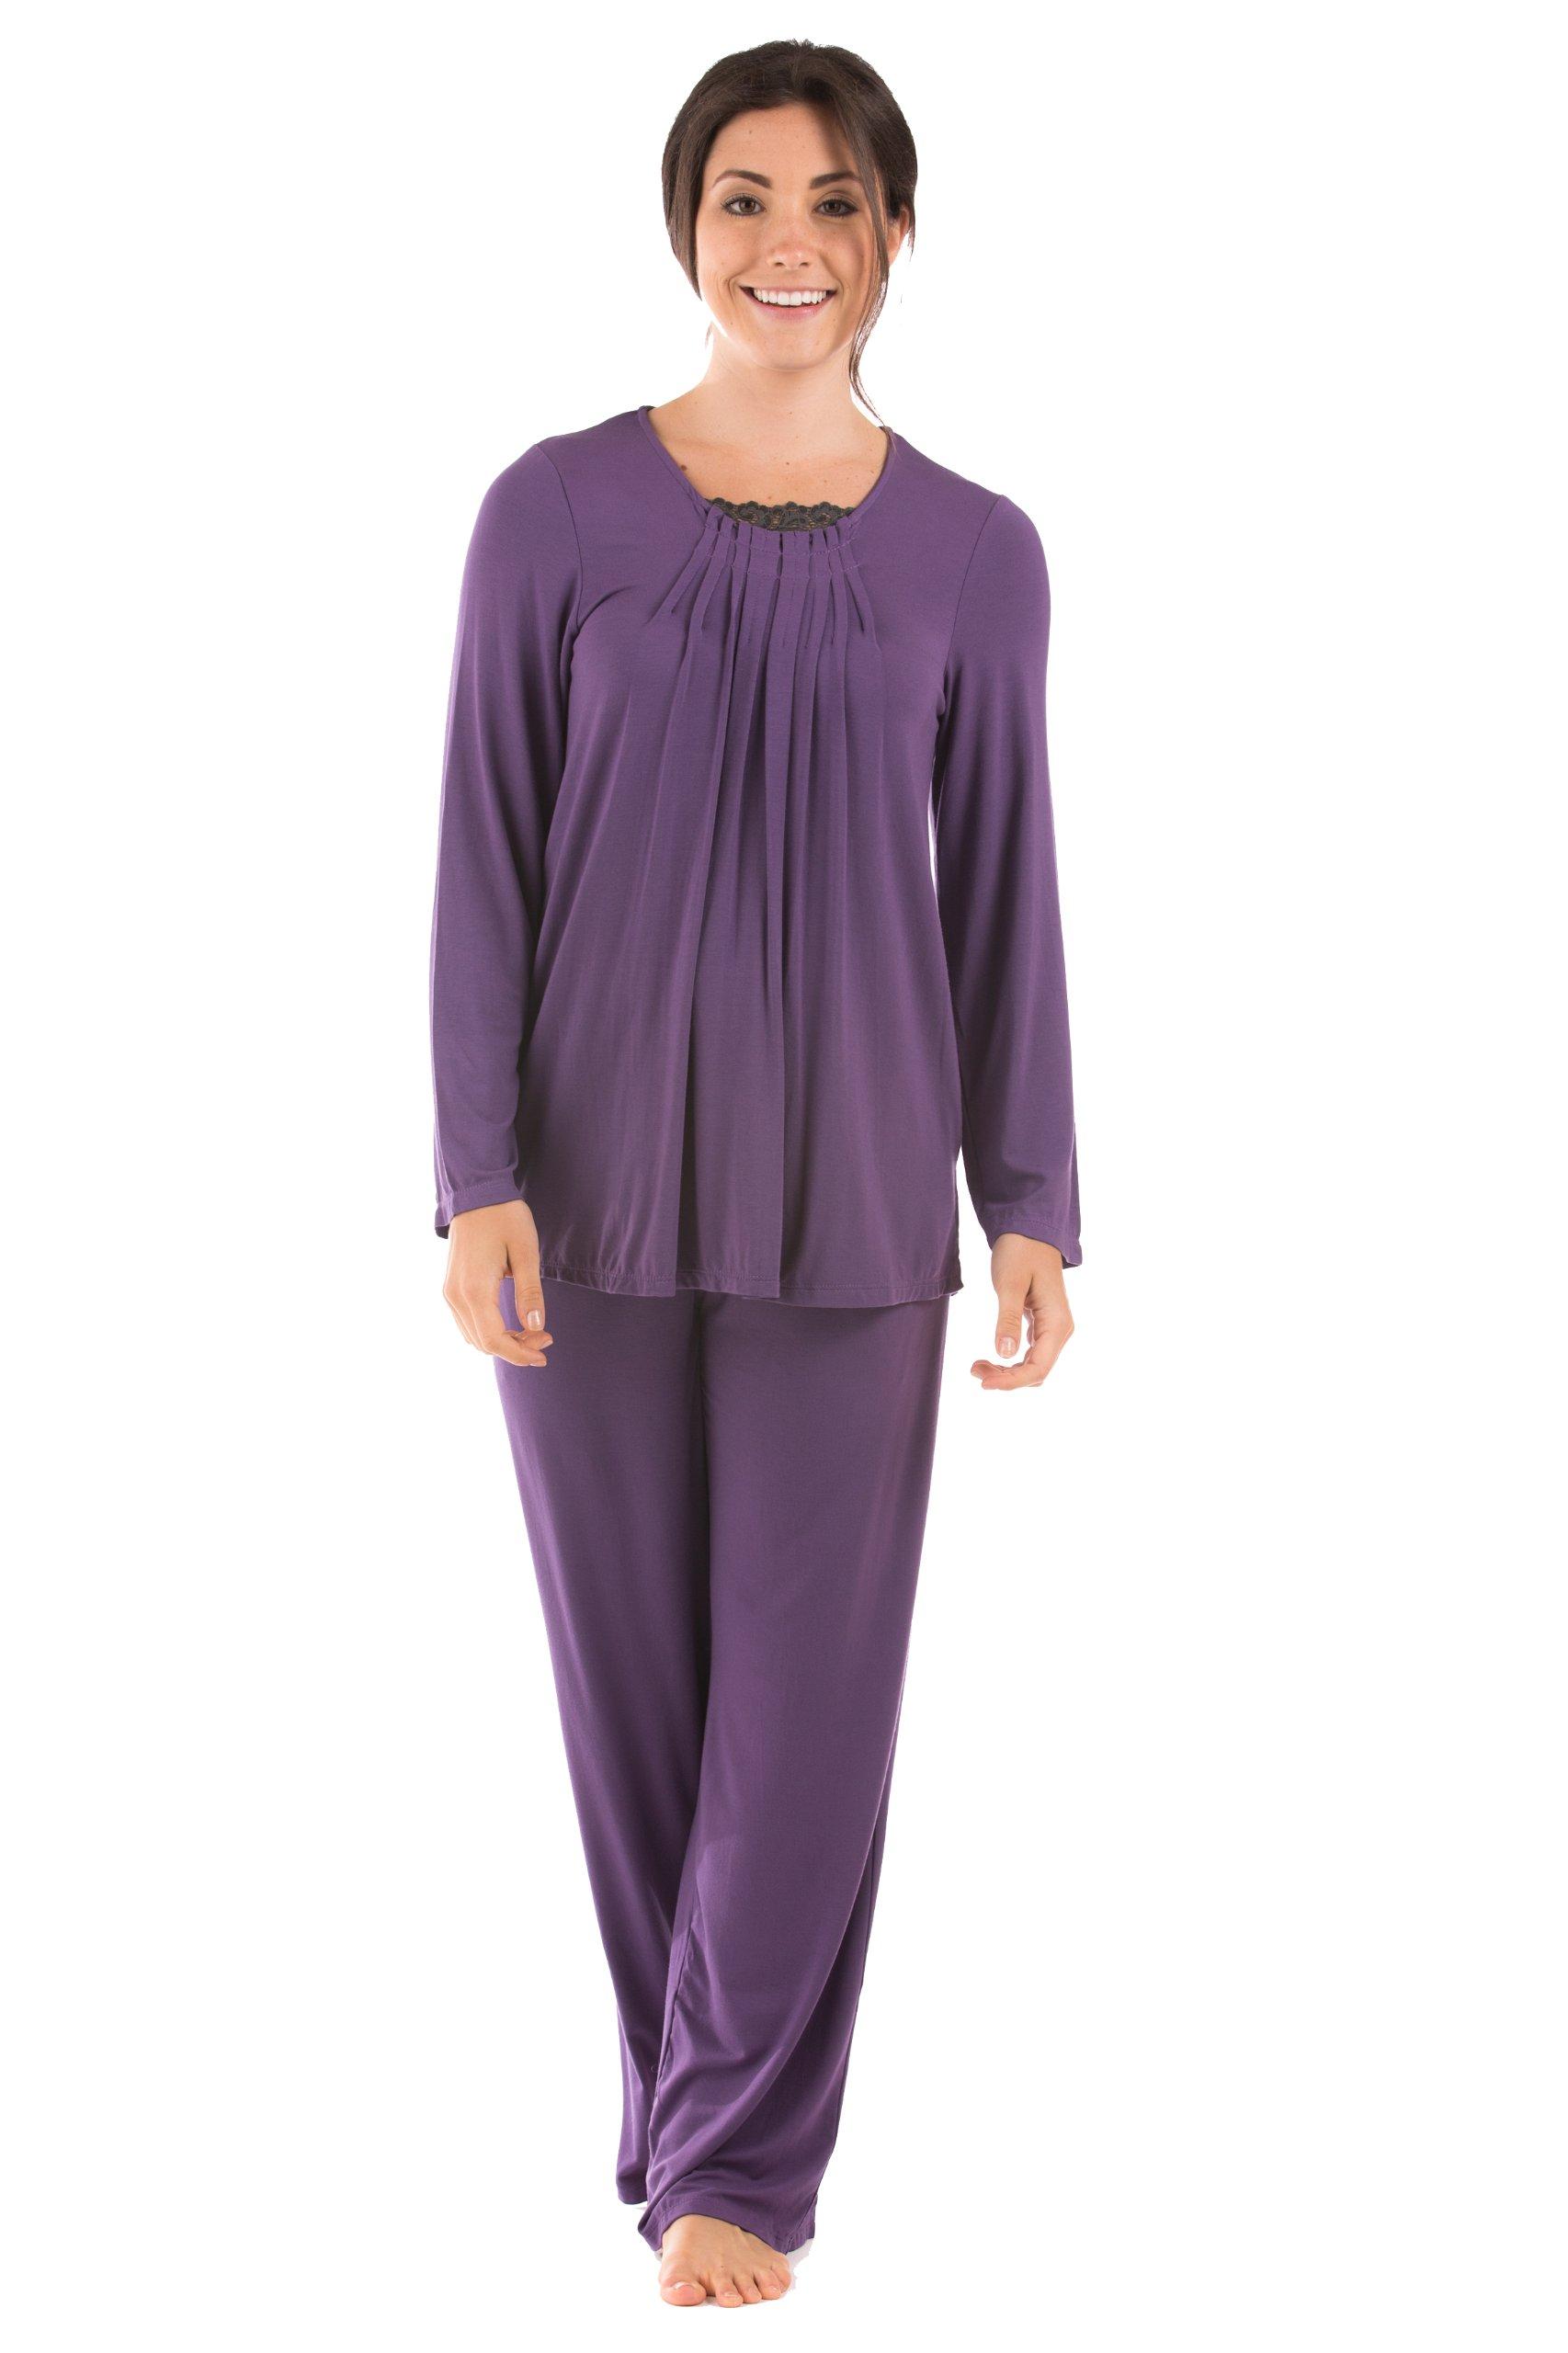 Texere Women's Long Sleeve Pajama Set (Amethyst, Large/Petite) Beautiful Sleepwear for Her WB9993-AMT-LP